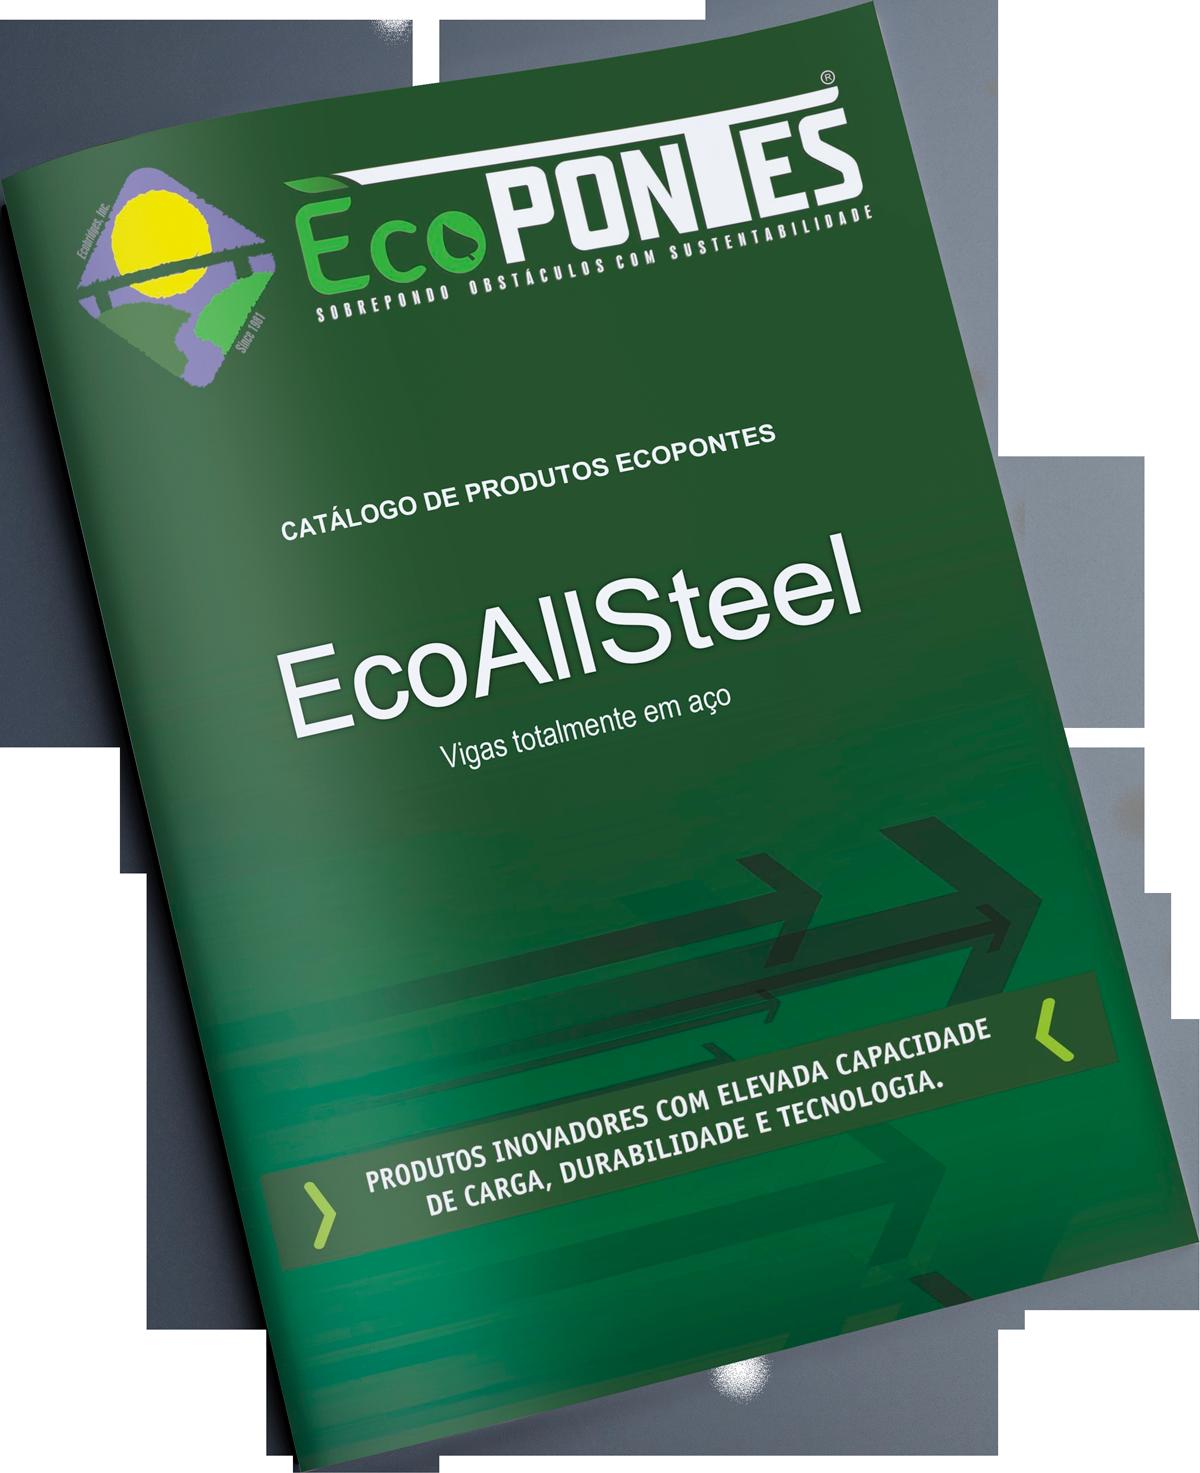 Ecopontes - EcoAllSteel